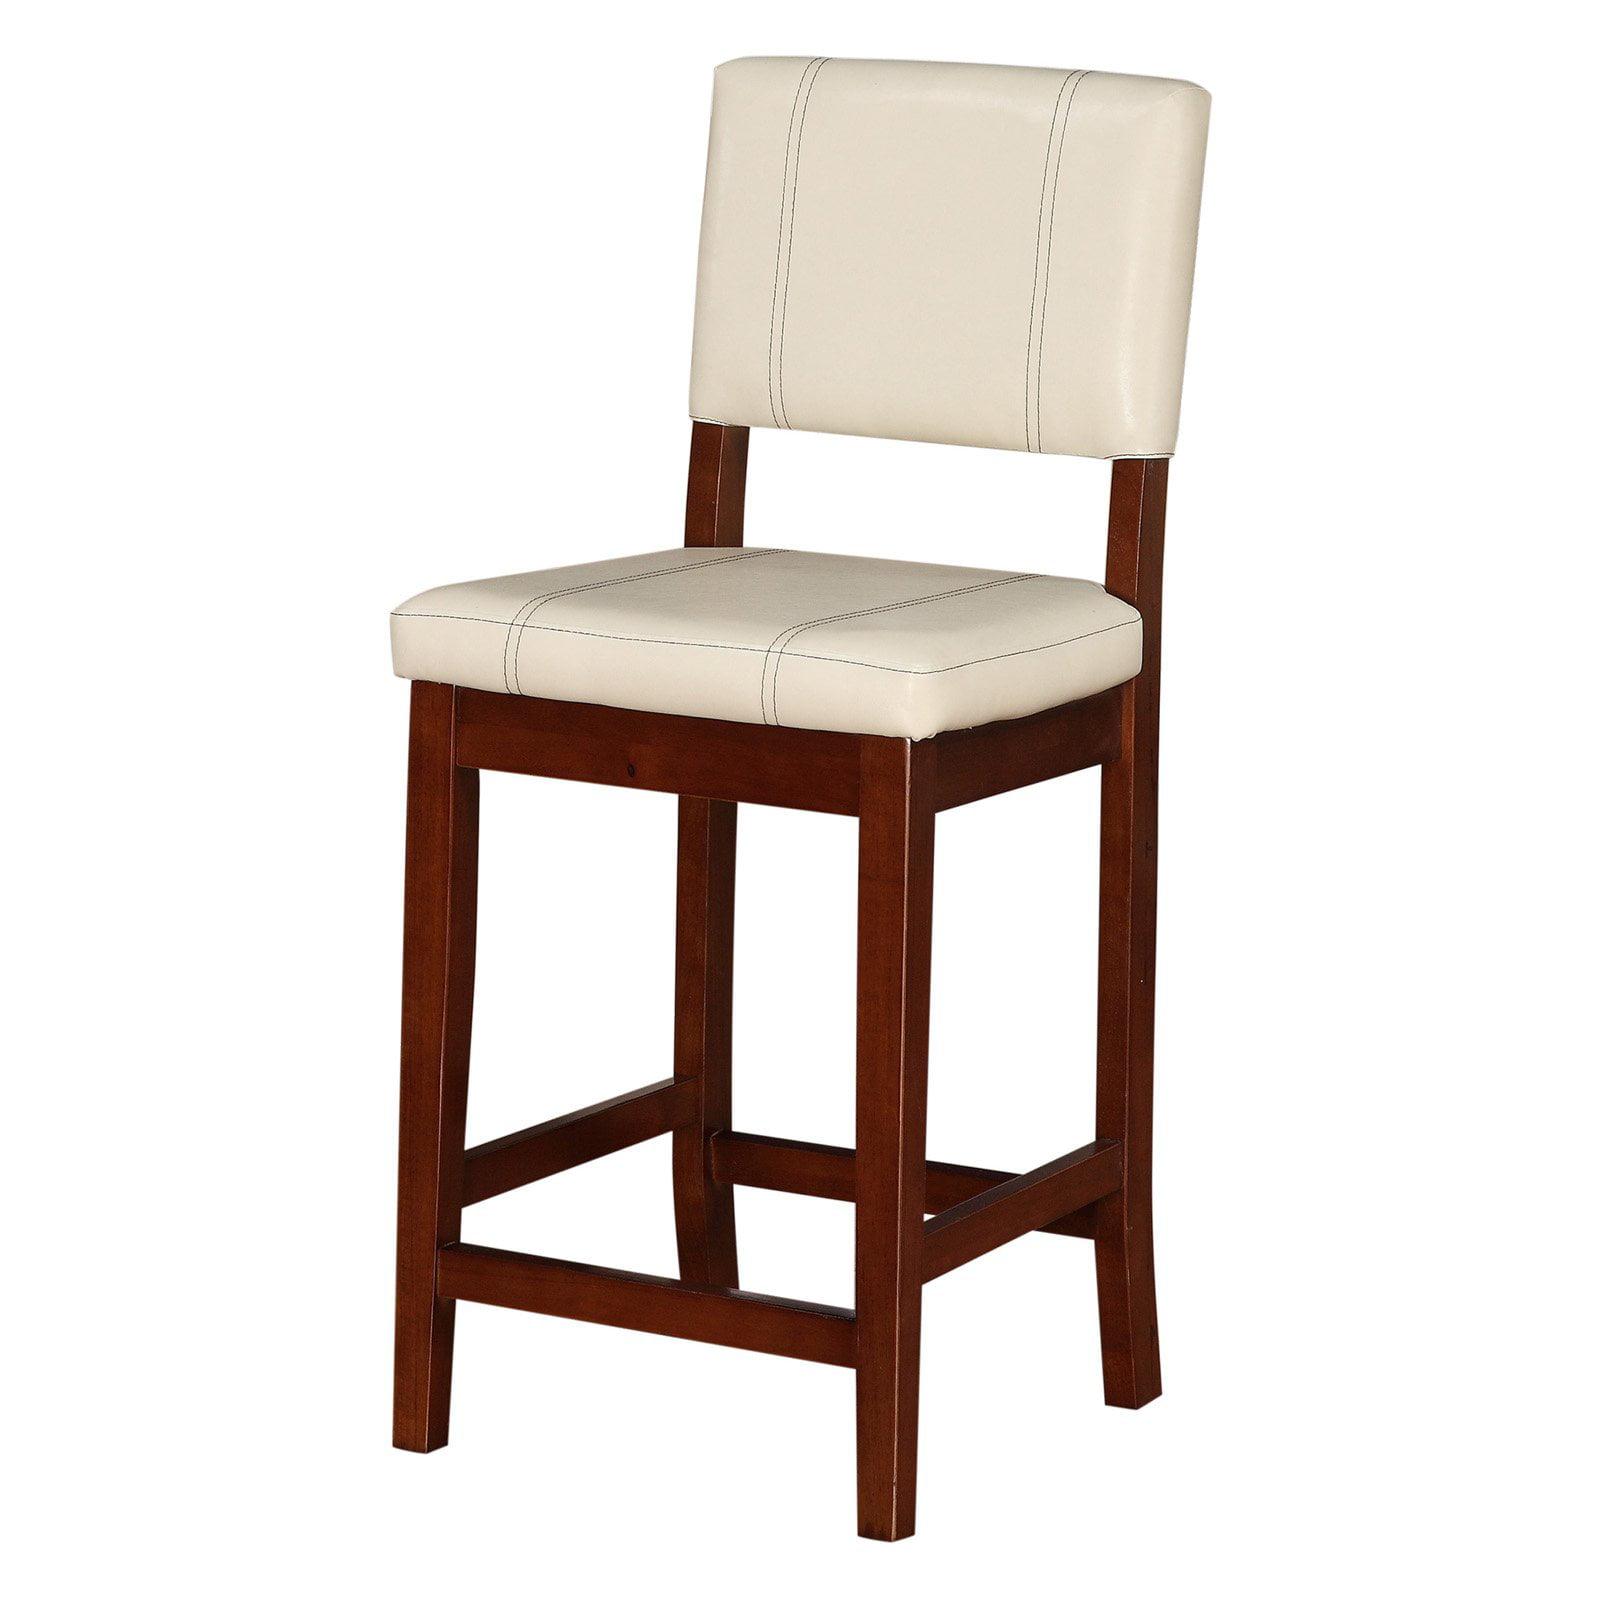 Linon Milano Counter Stool Cream 24 Inch Seat Height